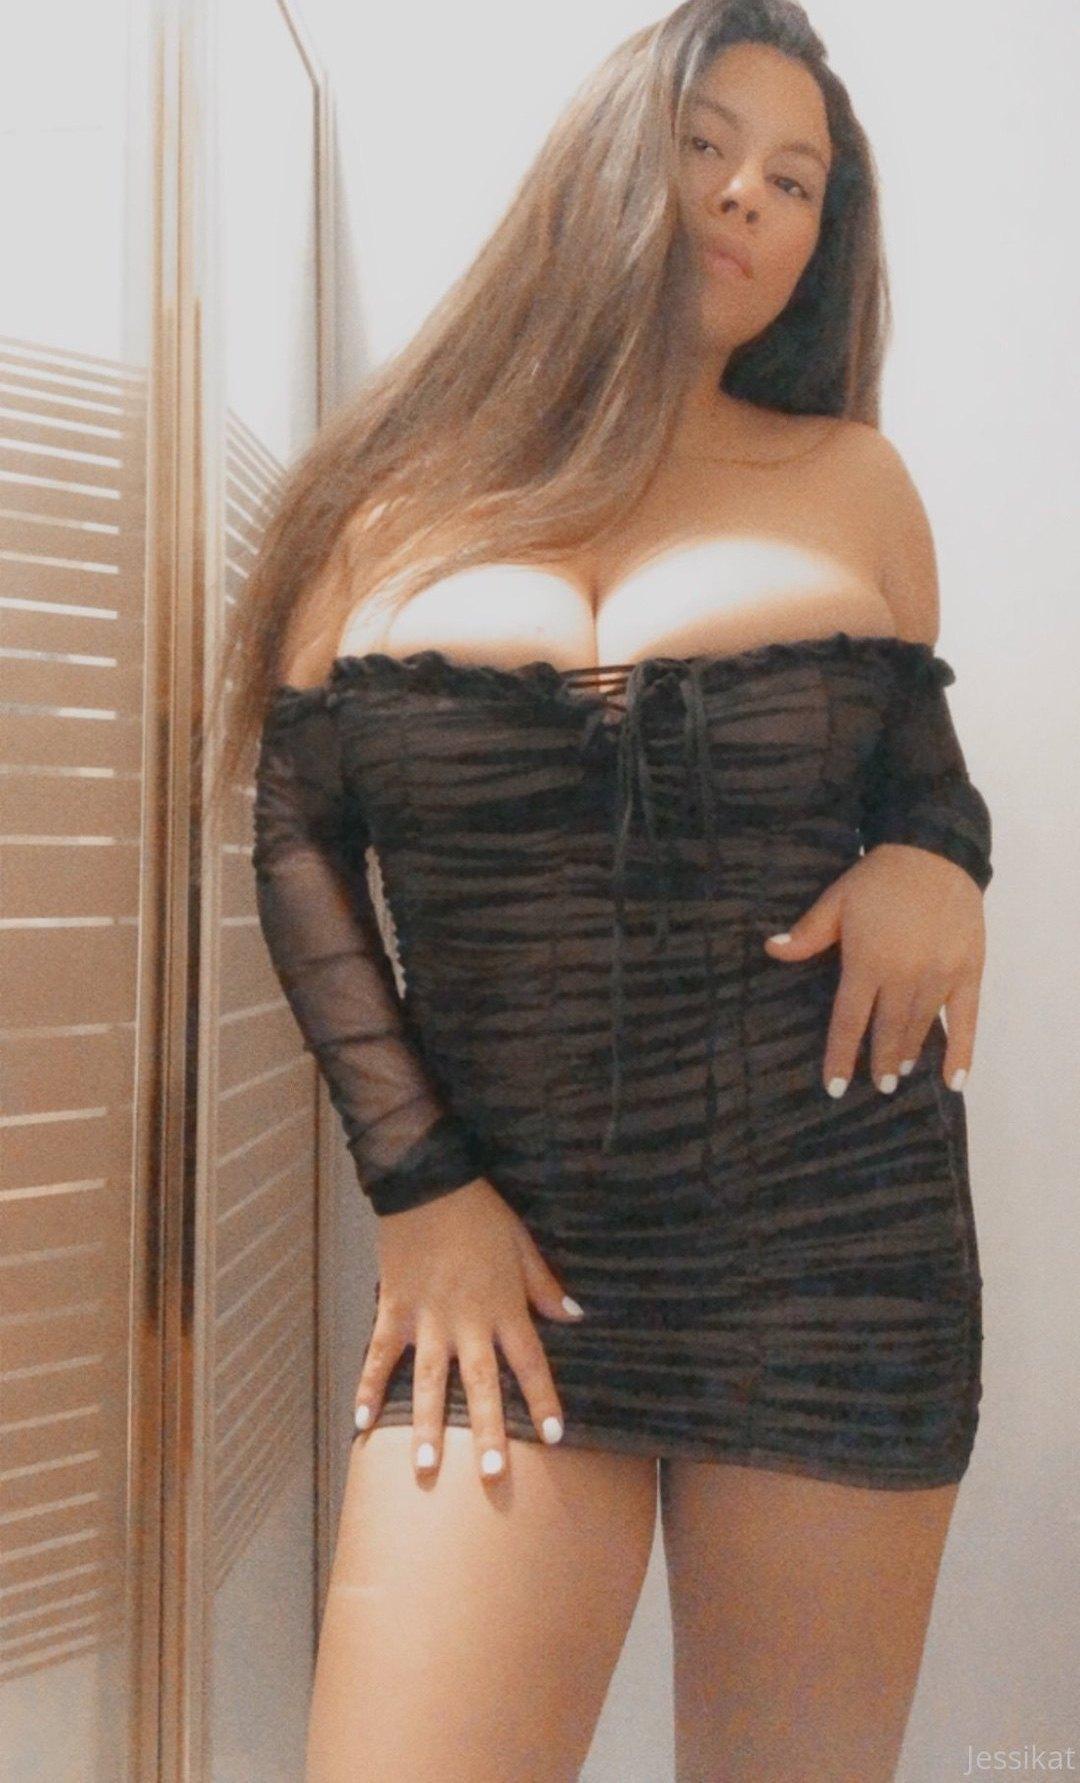 Jesselle Jessikat Onlyfans Nudes Leaks 0001